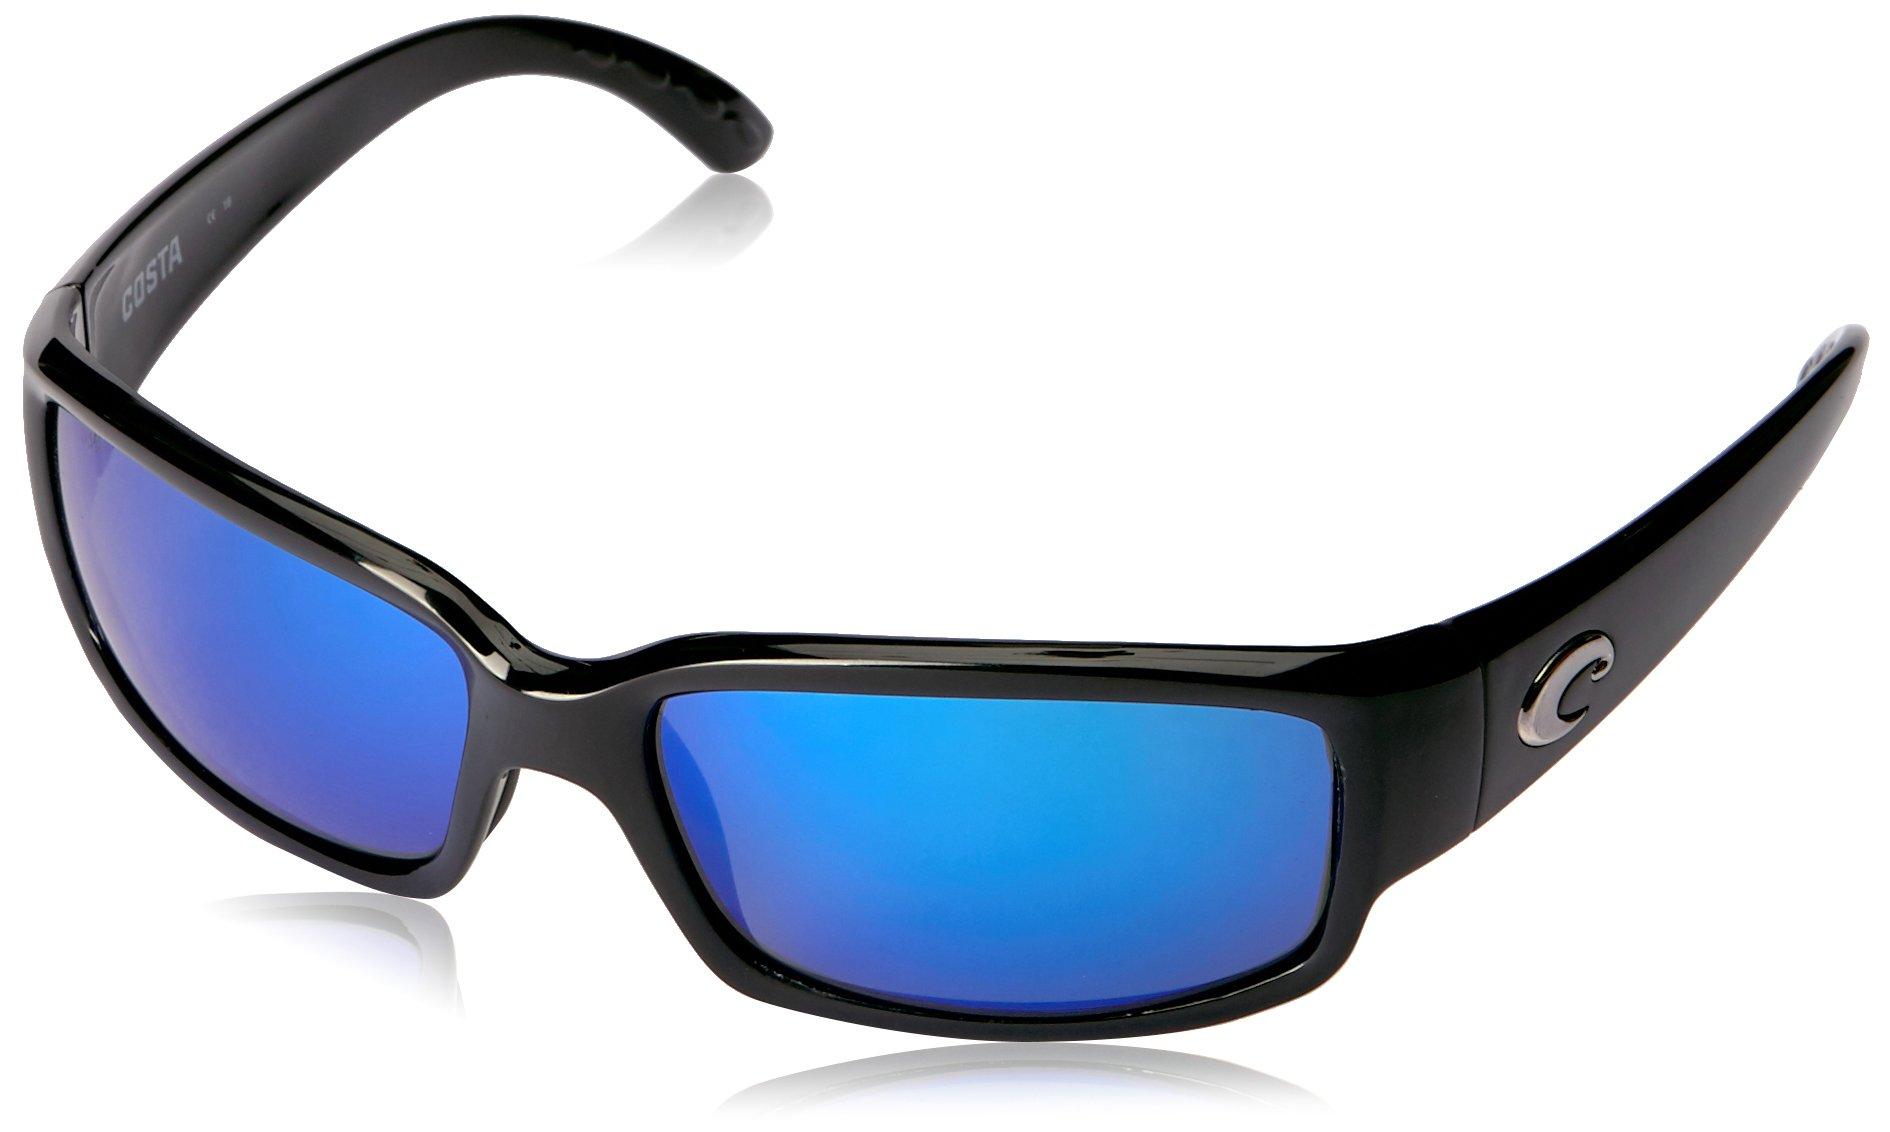 Costa del Mar Unisex-Adult Cabalitto CL 11 OBMGLP Polarized Iridium Wrap Sunglasses, Black, 59.2 mm